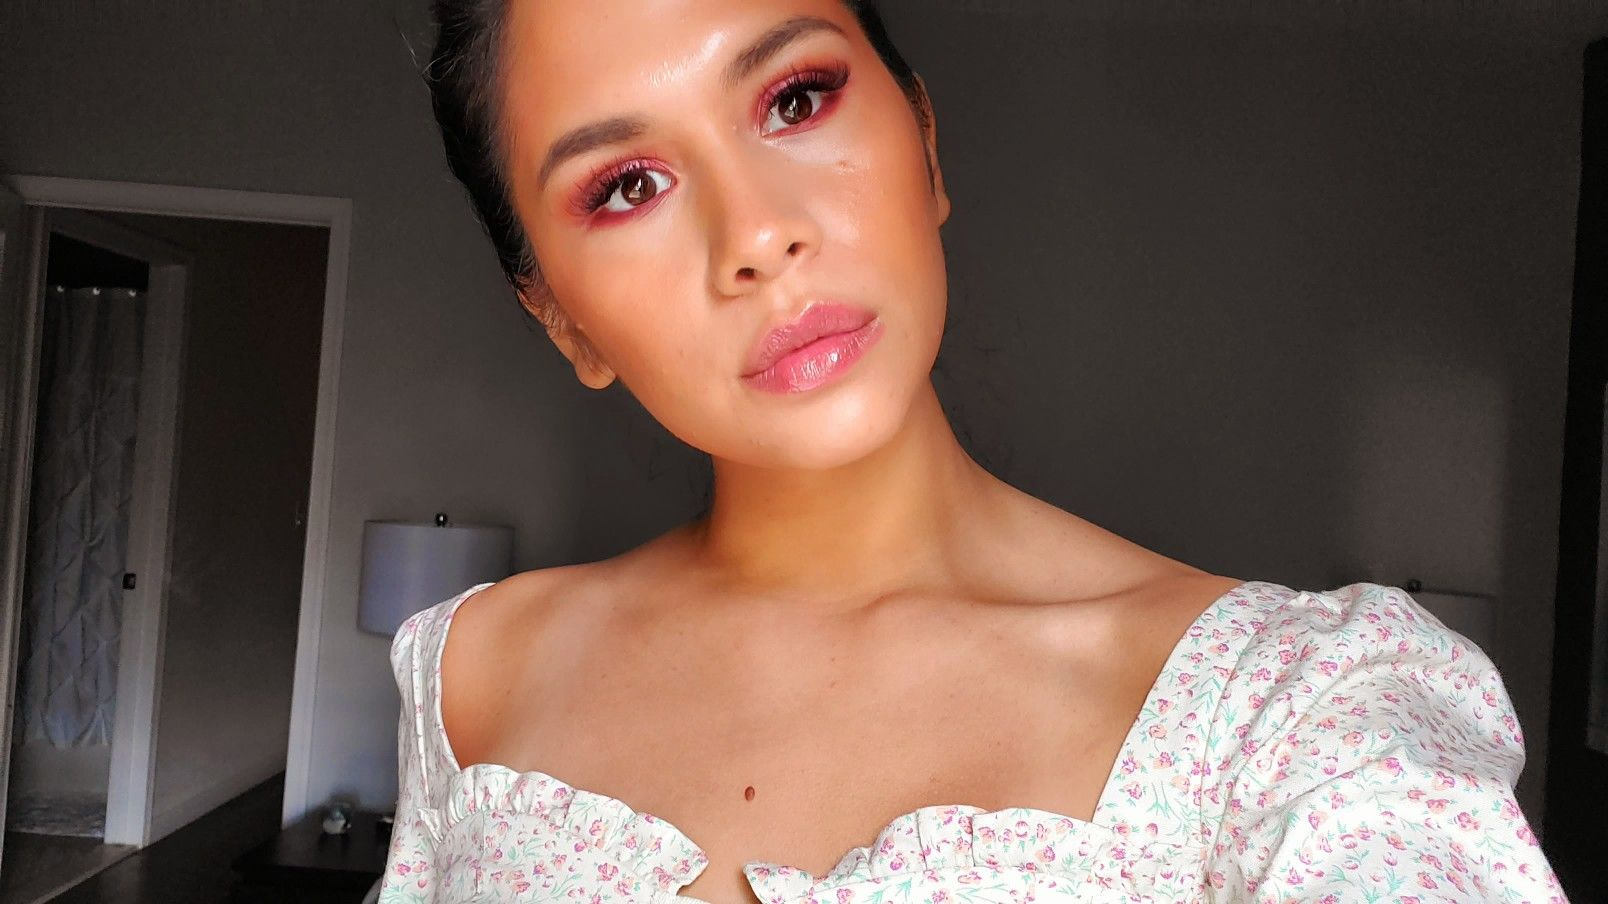 Minimal makeup look Minimal makeup look, Makeup looks